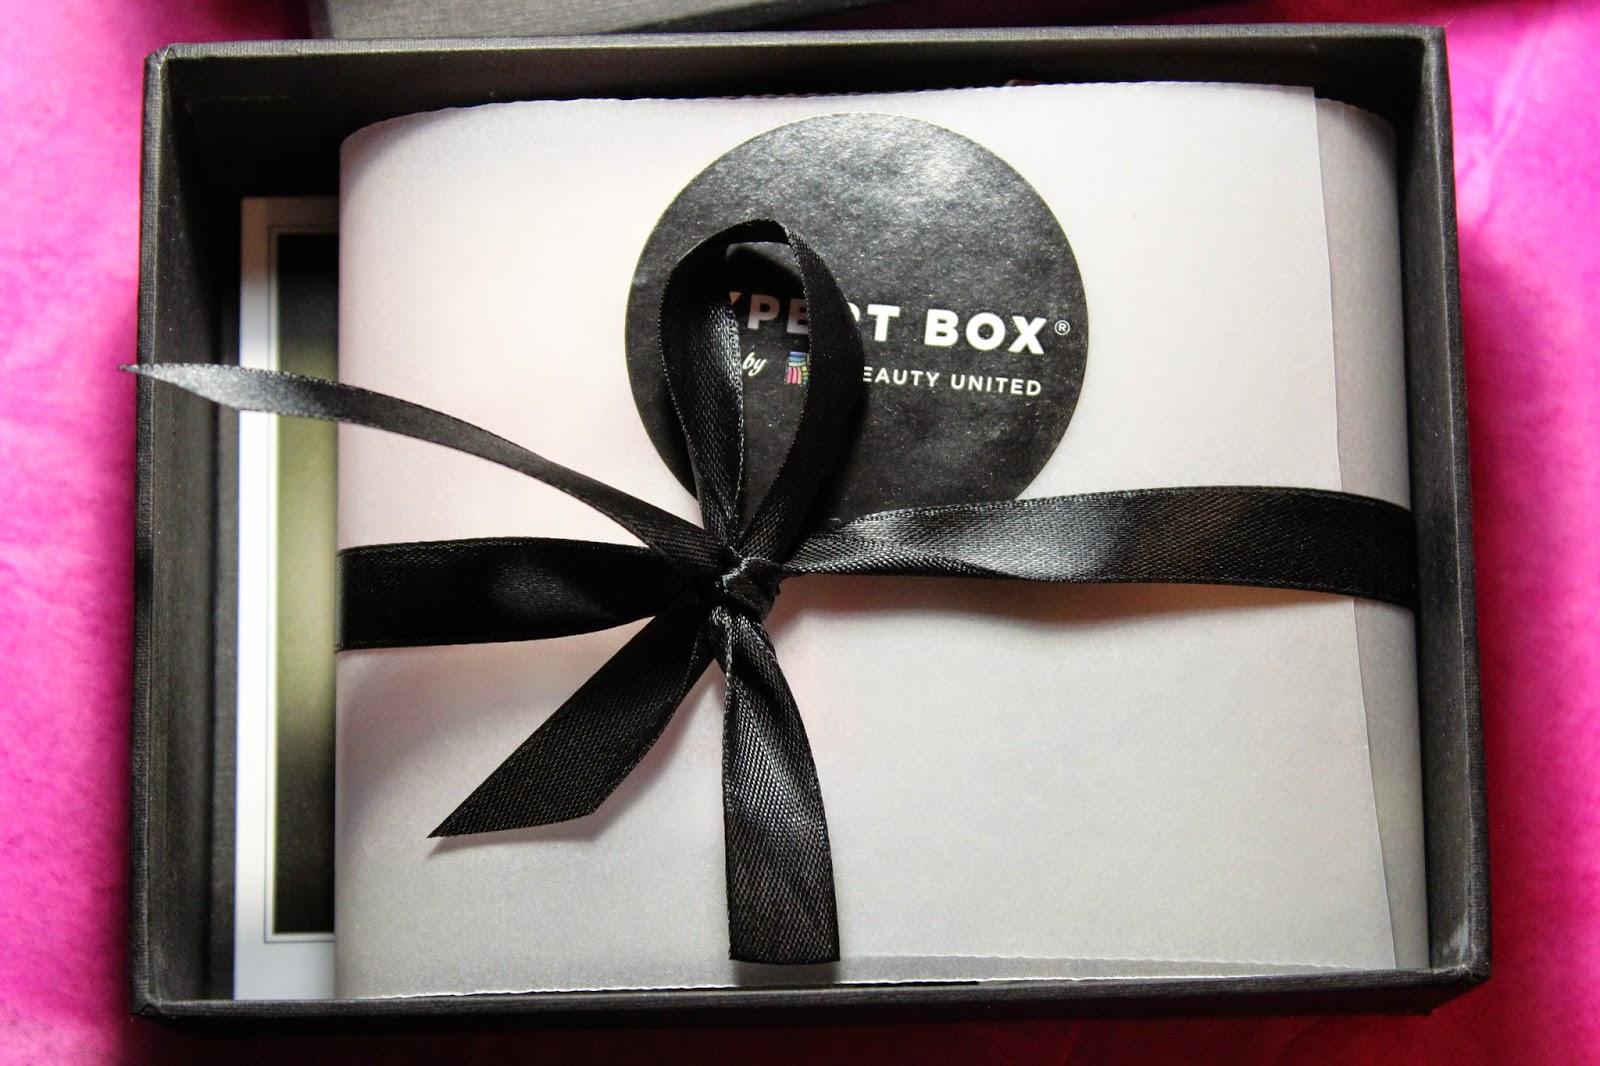 Обзор сервиса по подписке на нишевые пробники EXPERT BOX #1 от Beauty United